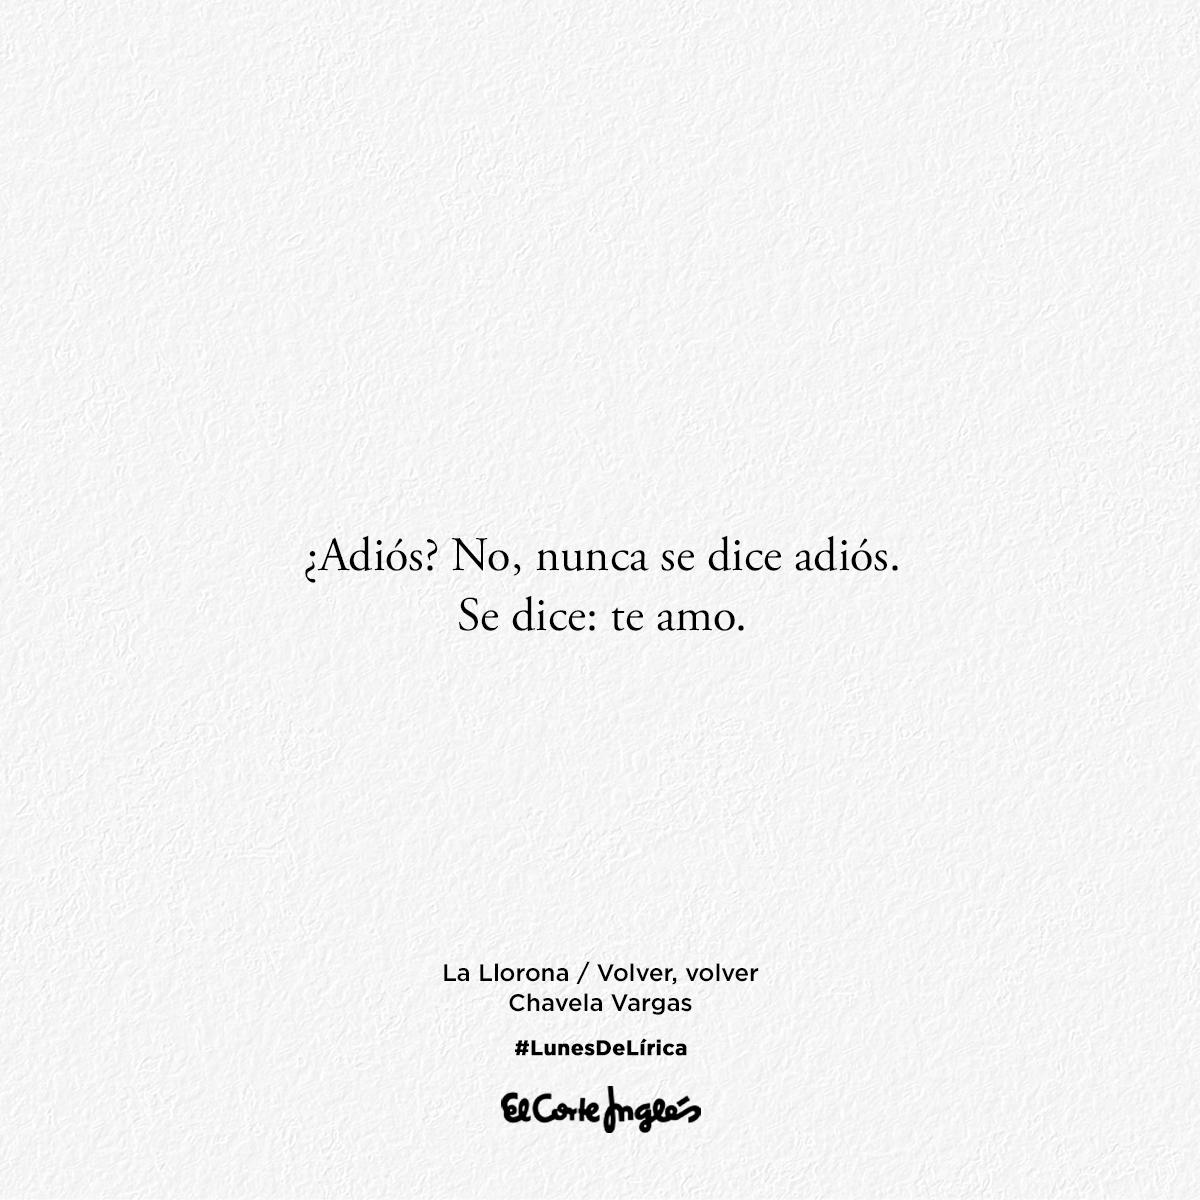 "Hoy parafraseamos a la gran Chavela Vargas: ""Se dice: Te amo"". #LunesDeLírica 📖 http://bit.ly/2X6MeAM"